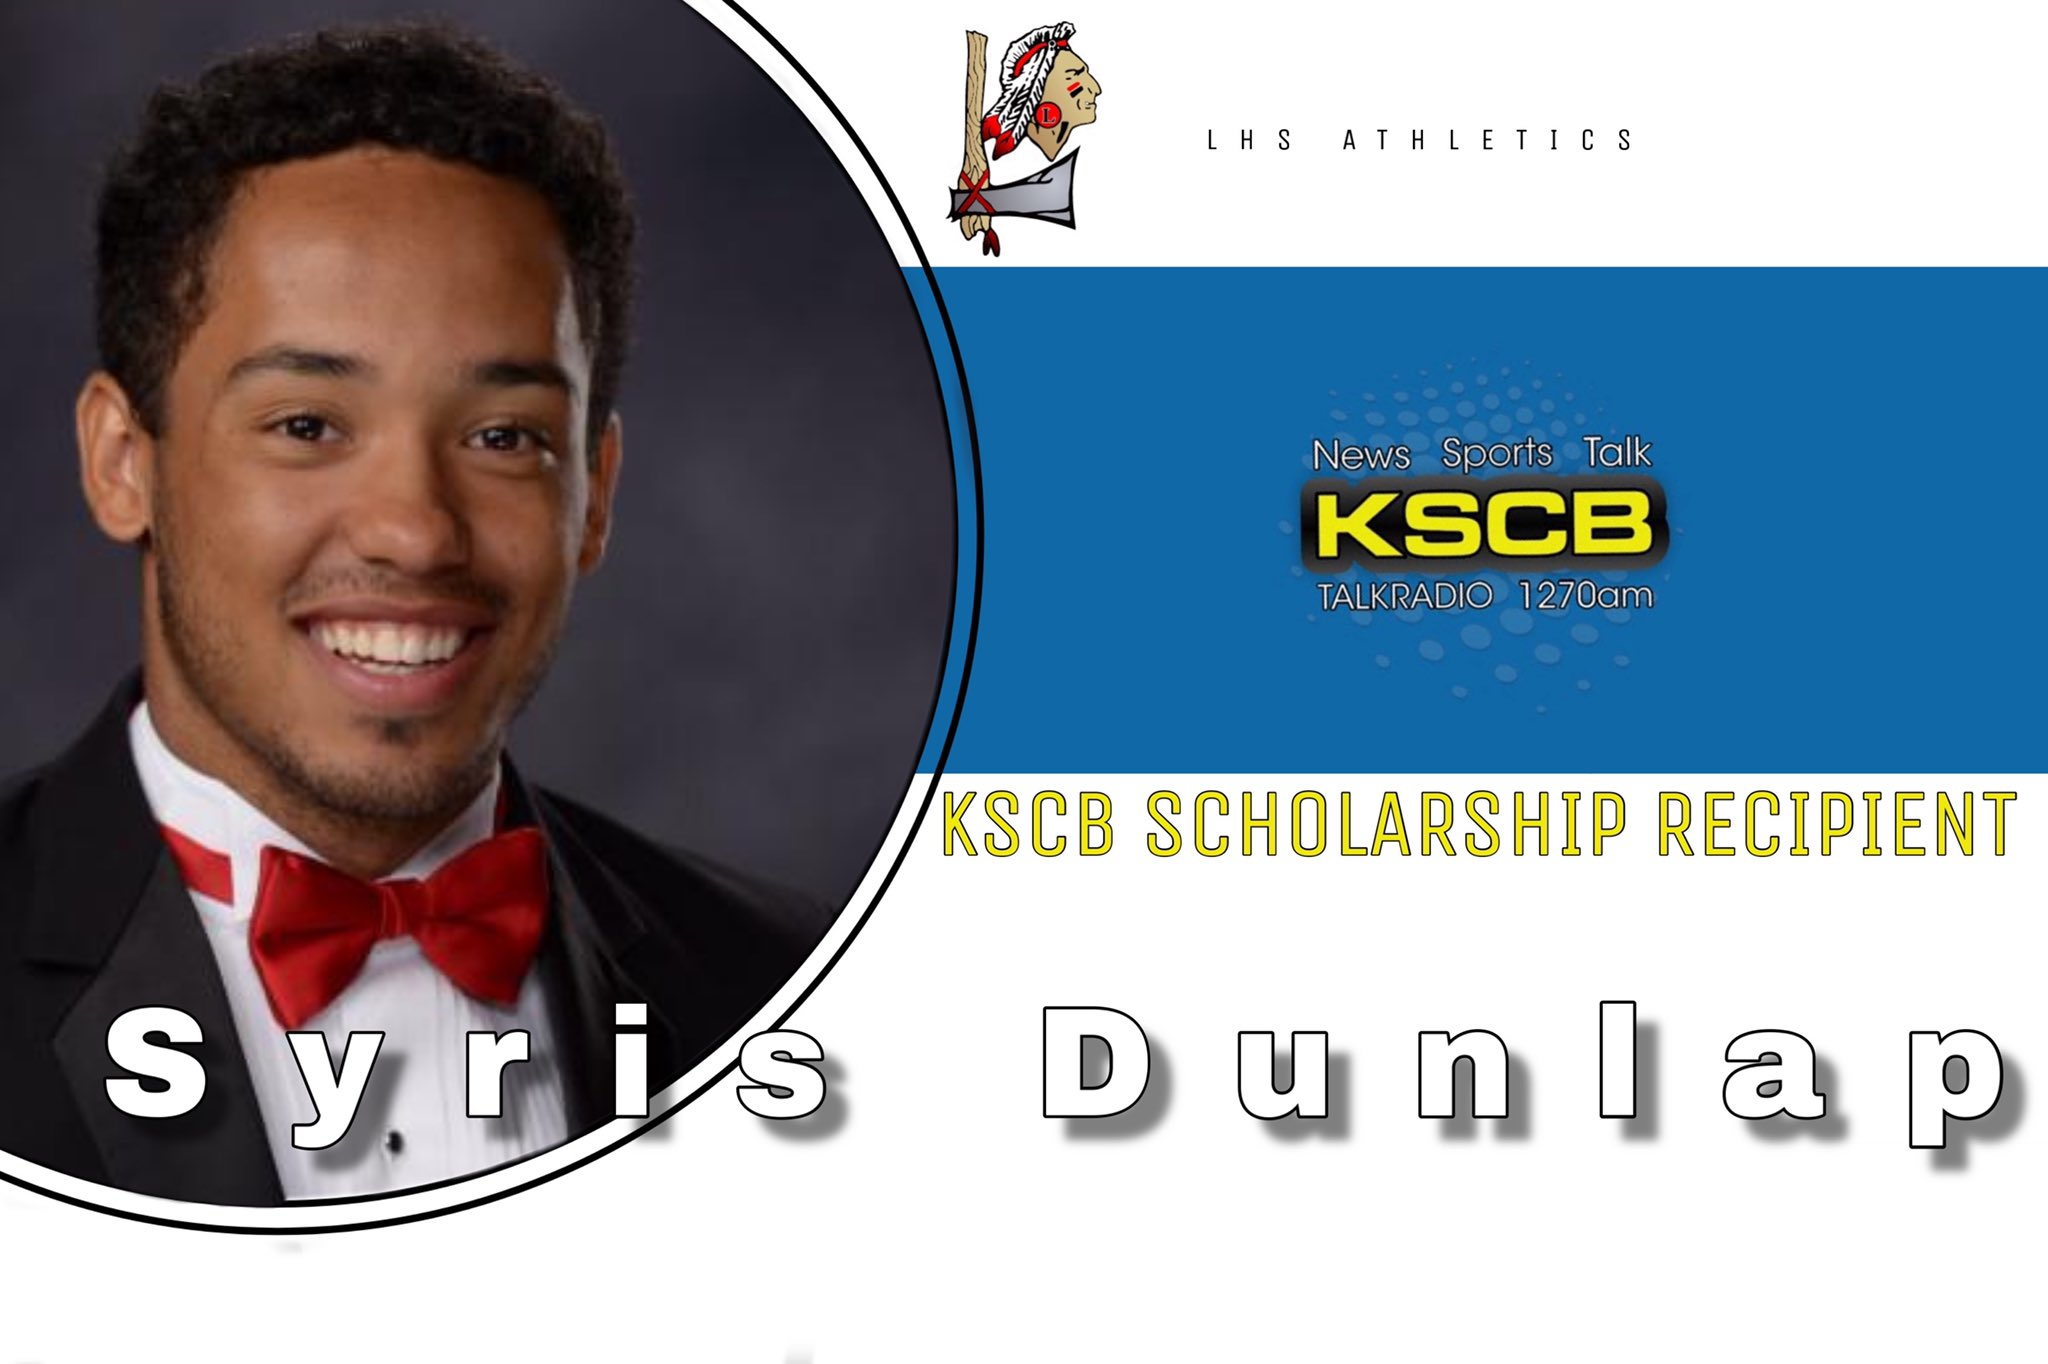 Syris Dunlap Wins KSCB Scholarship